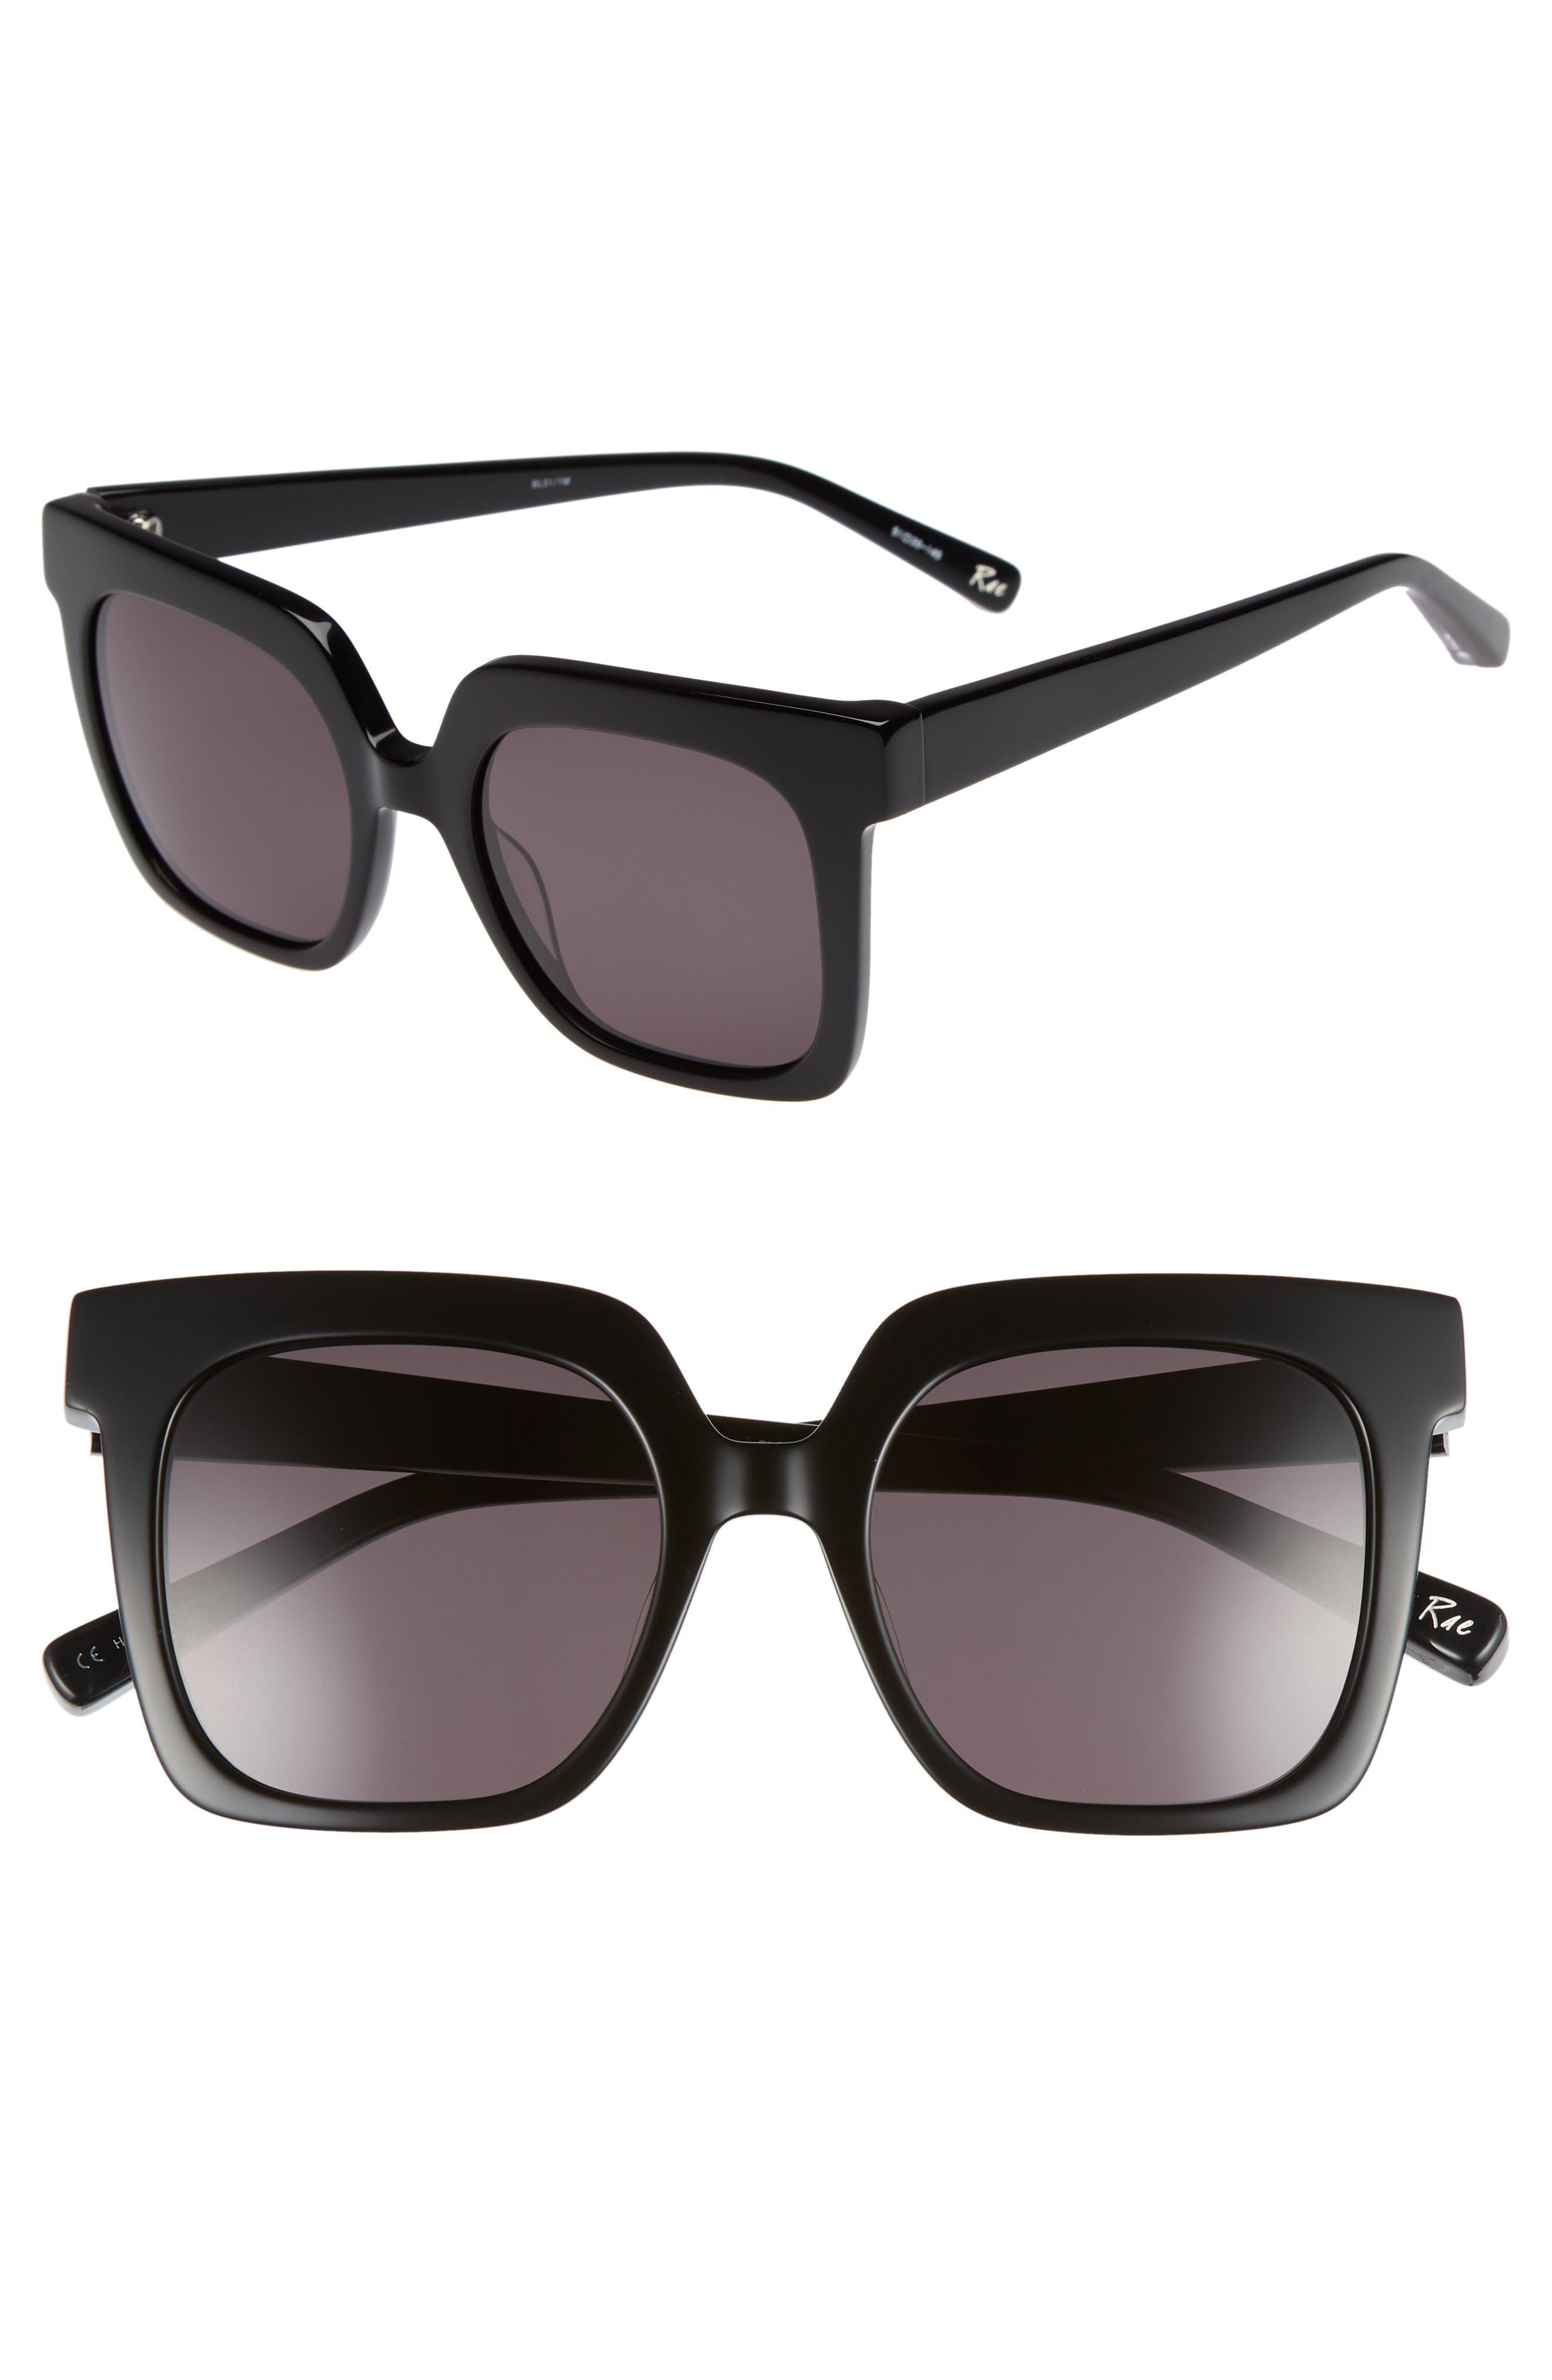 Rae 51mm Square Sunglasses,                         Main,                         color,